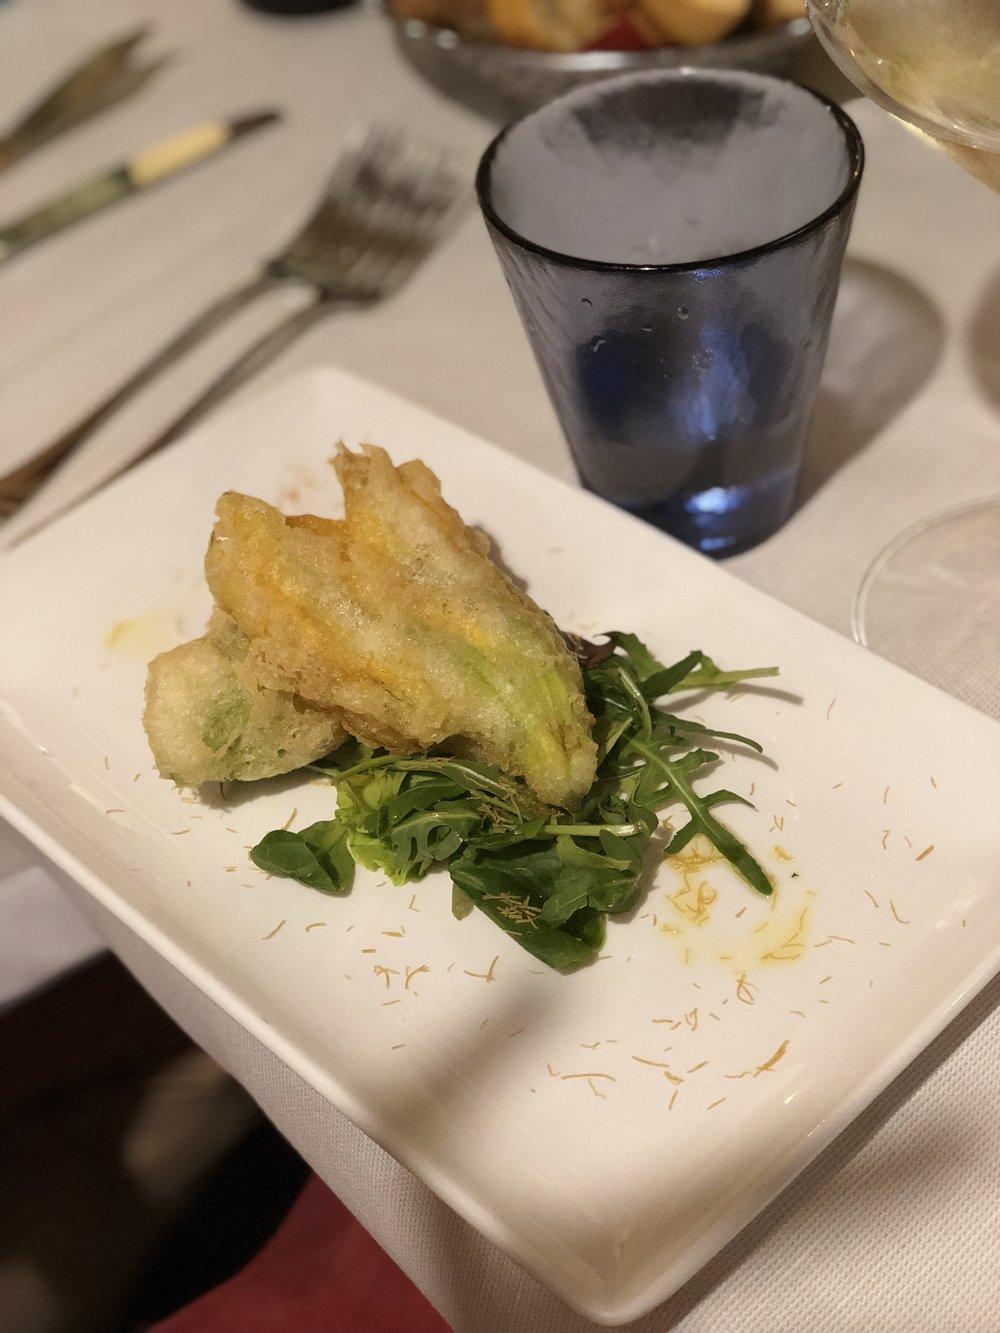 osteria oliva nera venice zucchini flowers